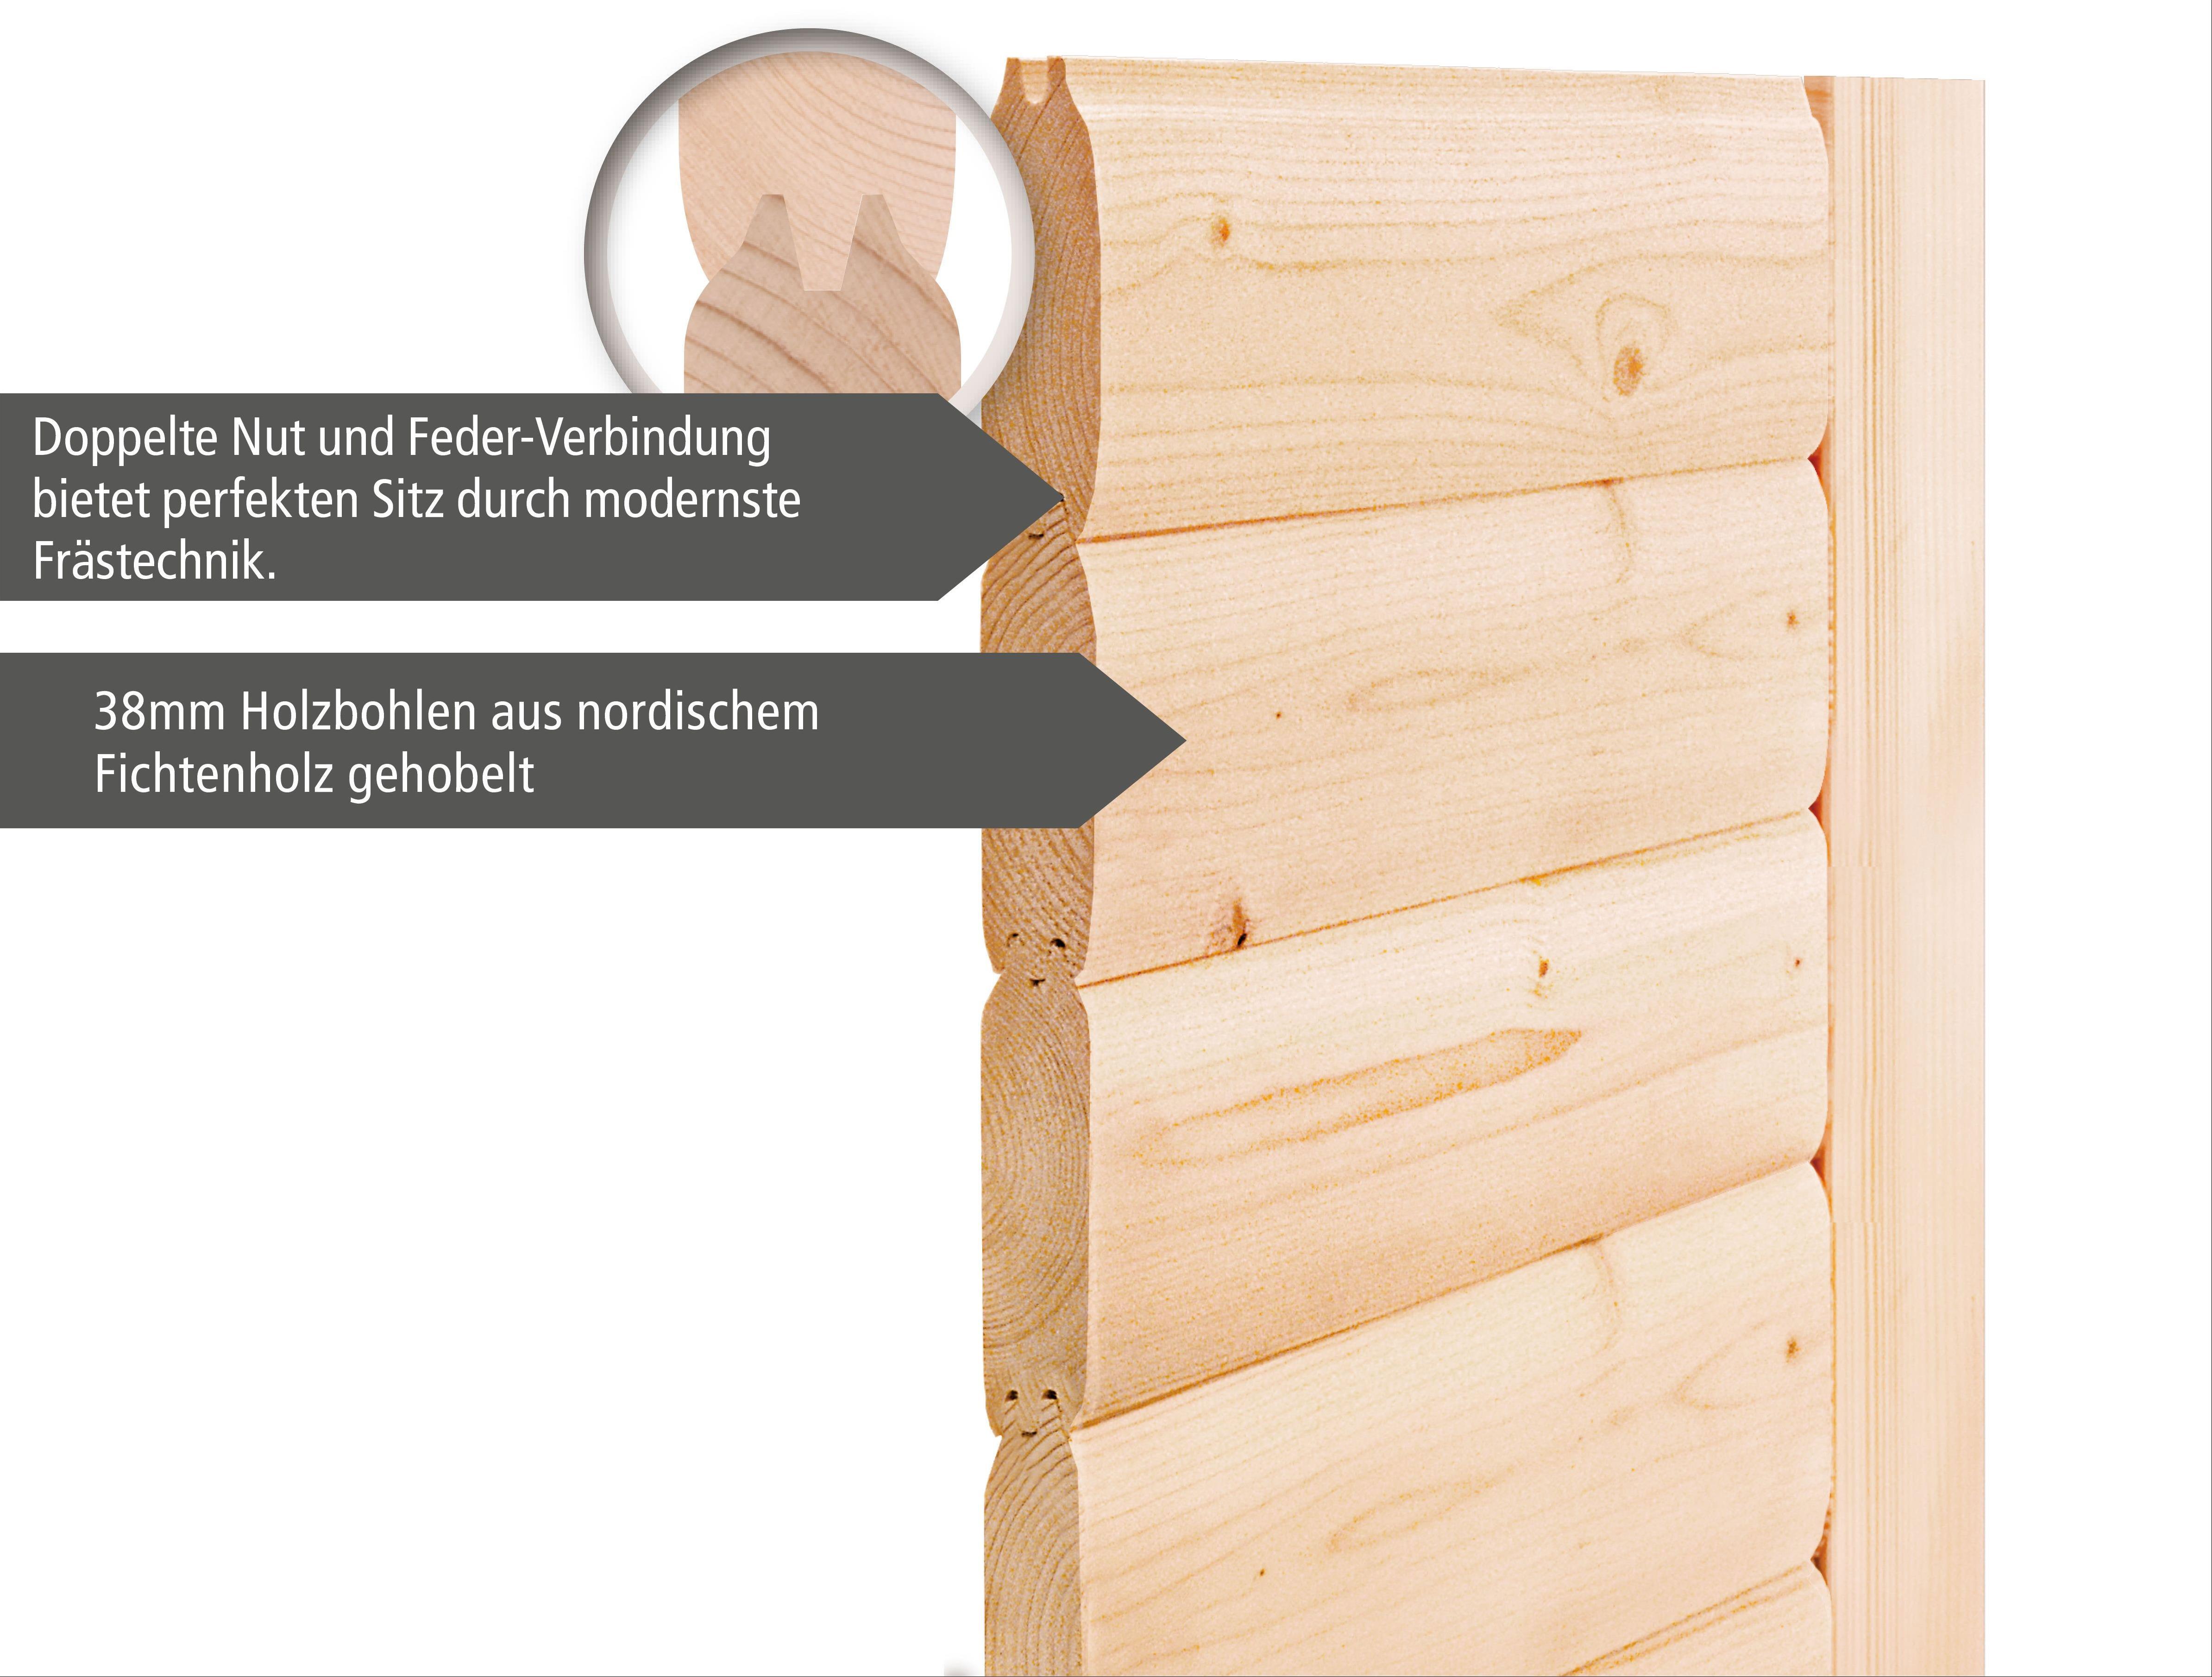 Woodfeeling Sauna Karla 38mm Kranz Ofen Bio 9kW Tür Holz Bild 5